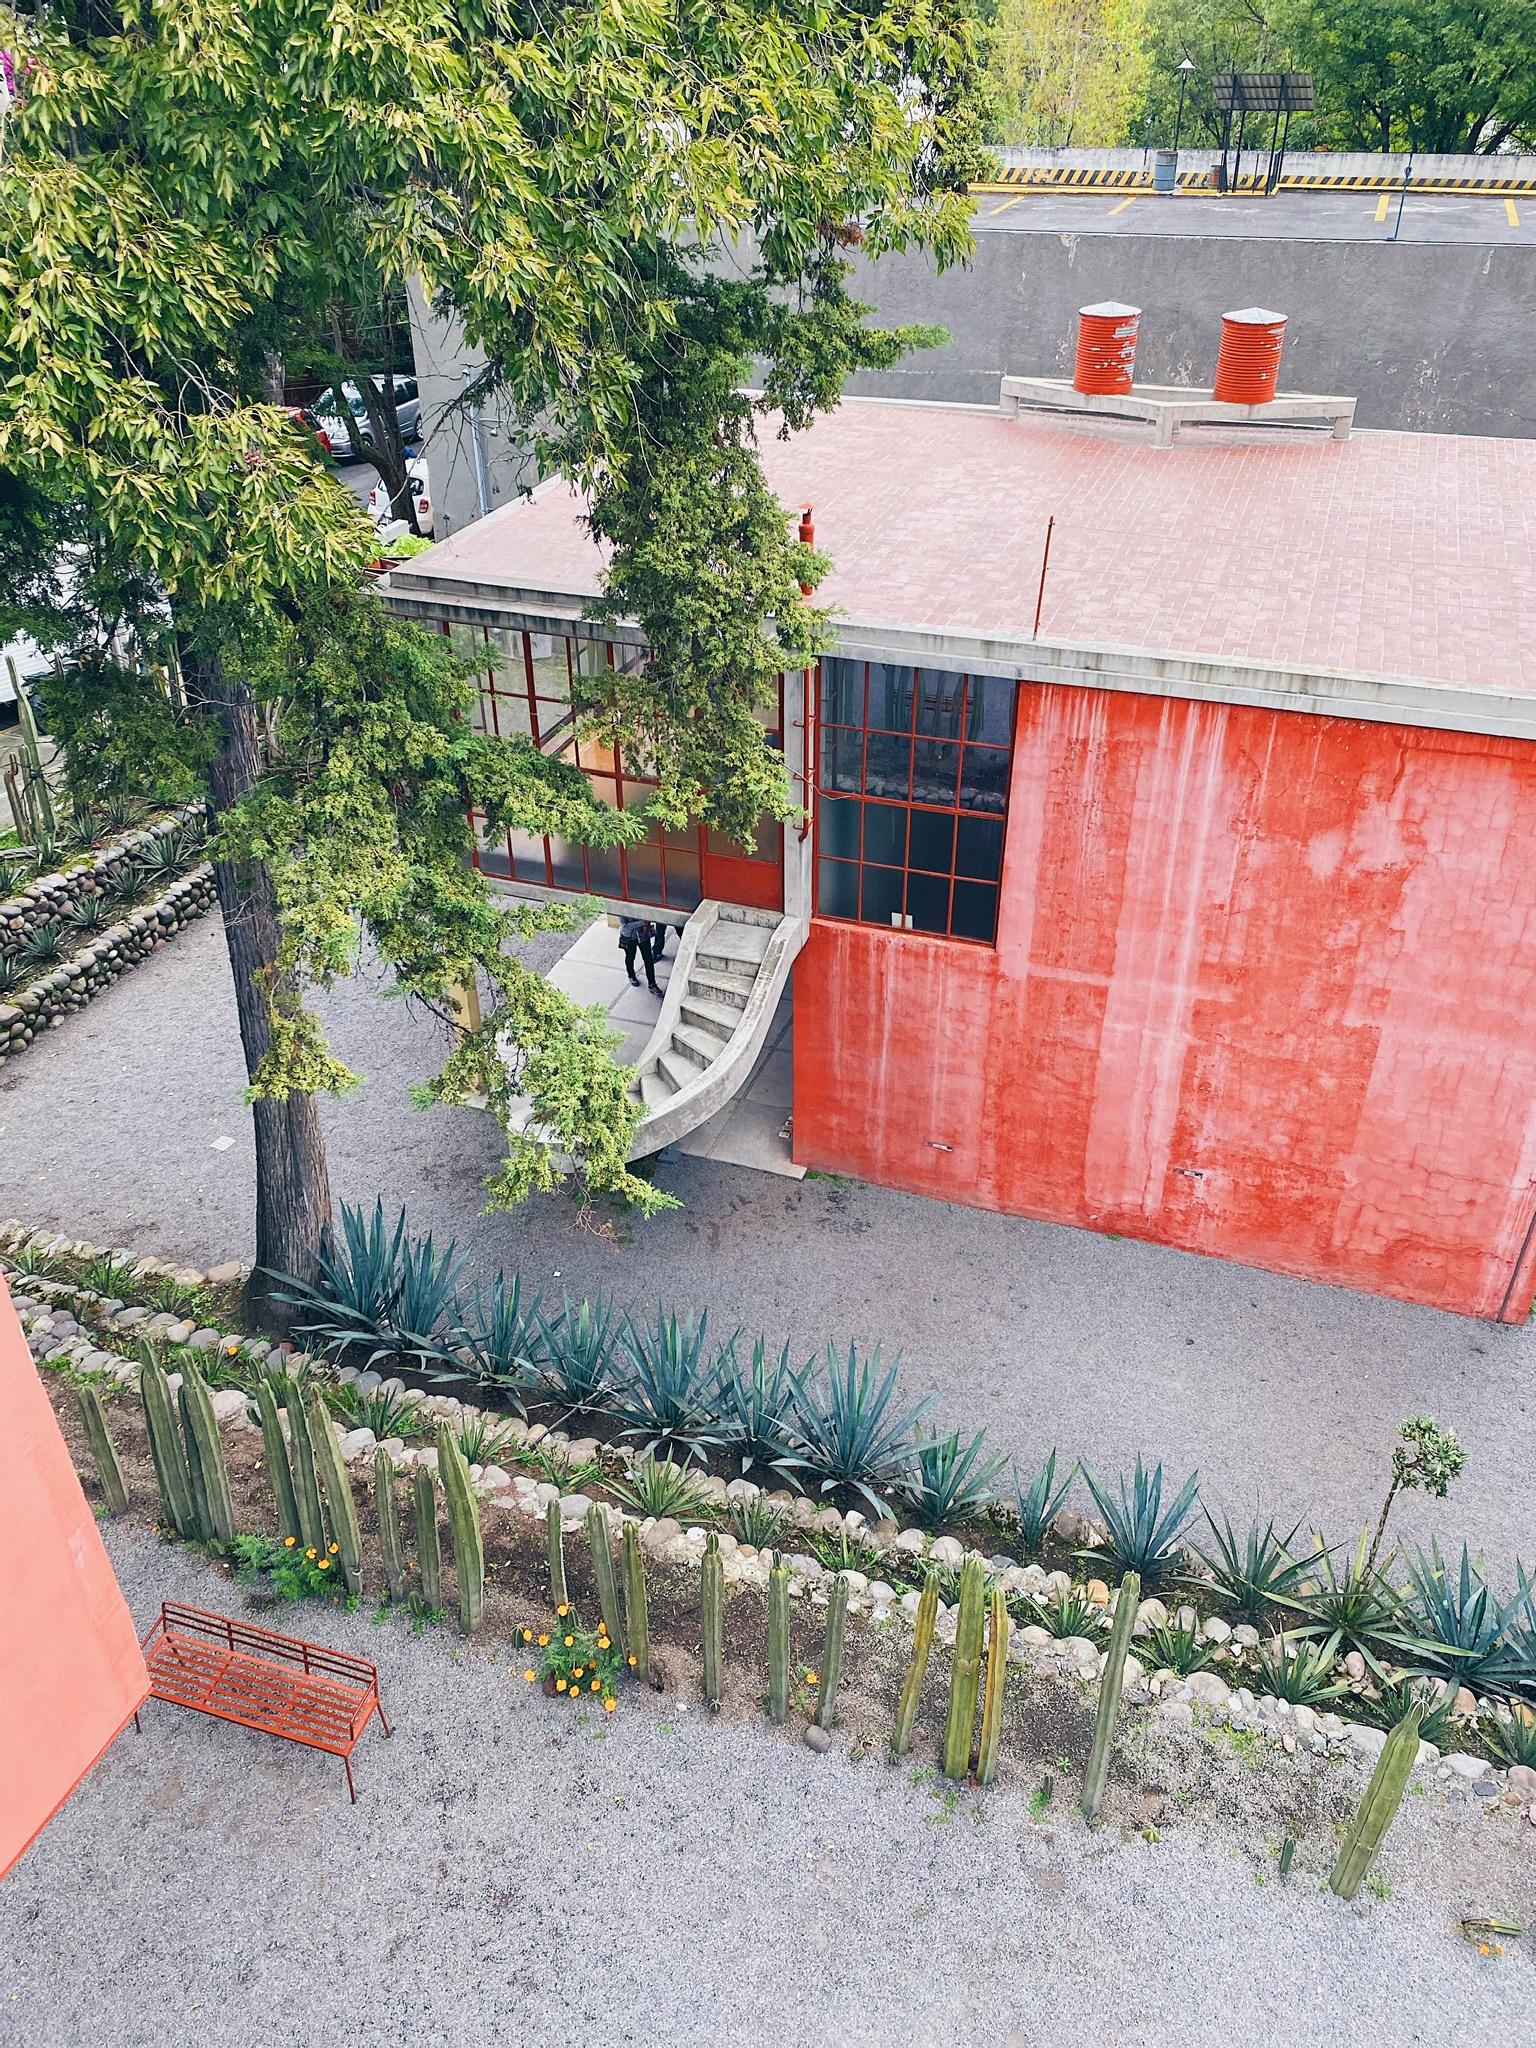 wu-haus-guide-to-mexico-city-cdmx-alison-wu-casa-estudio-diego-rivera-frida-kahlo